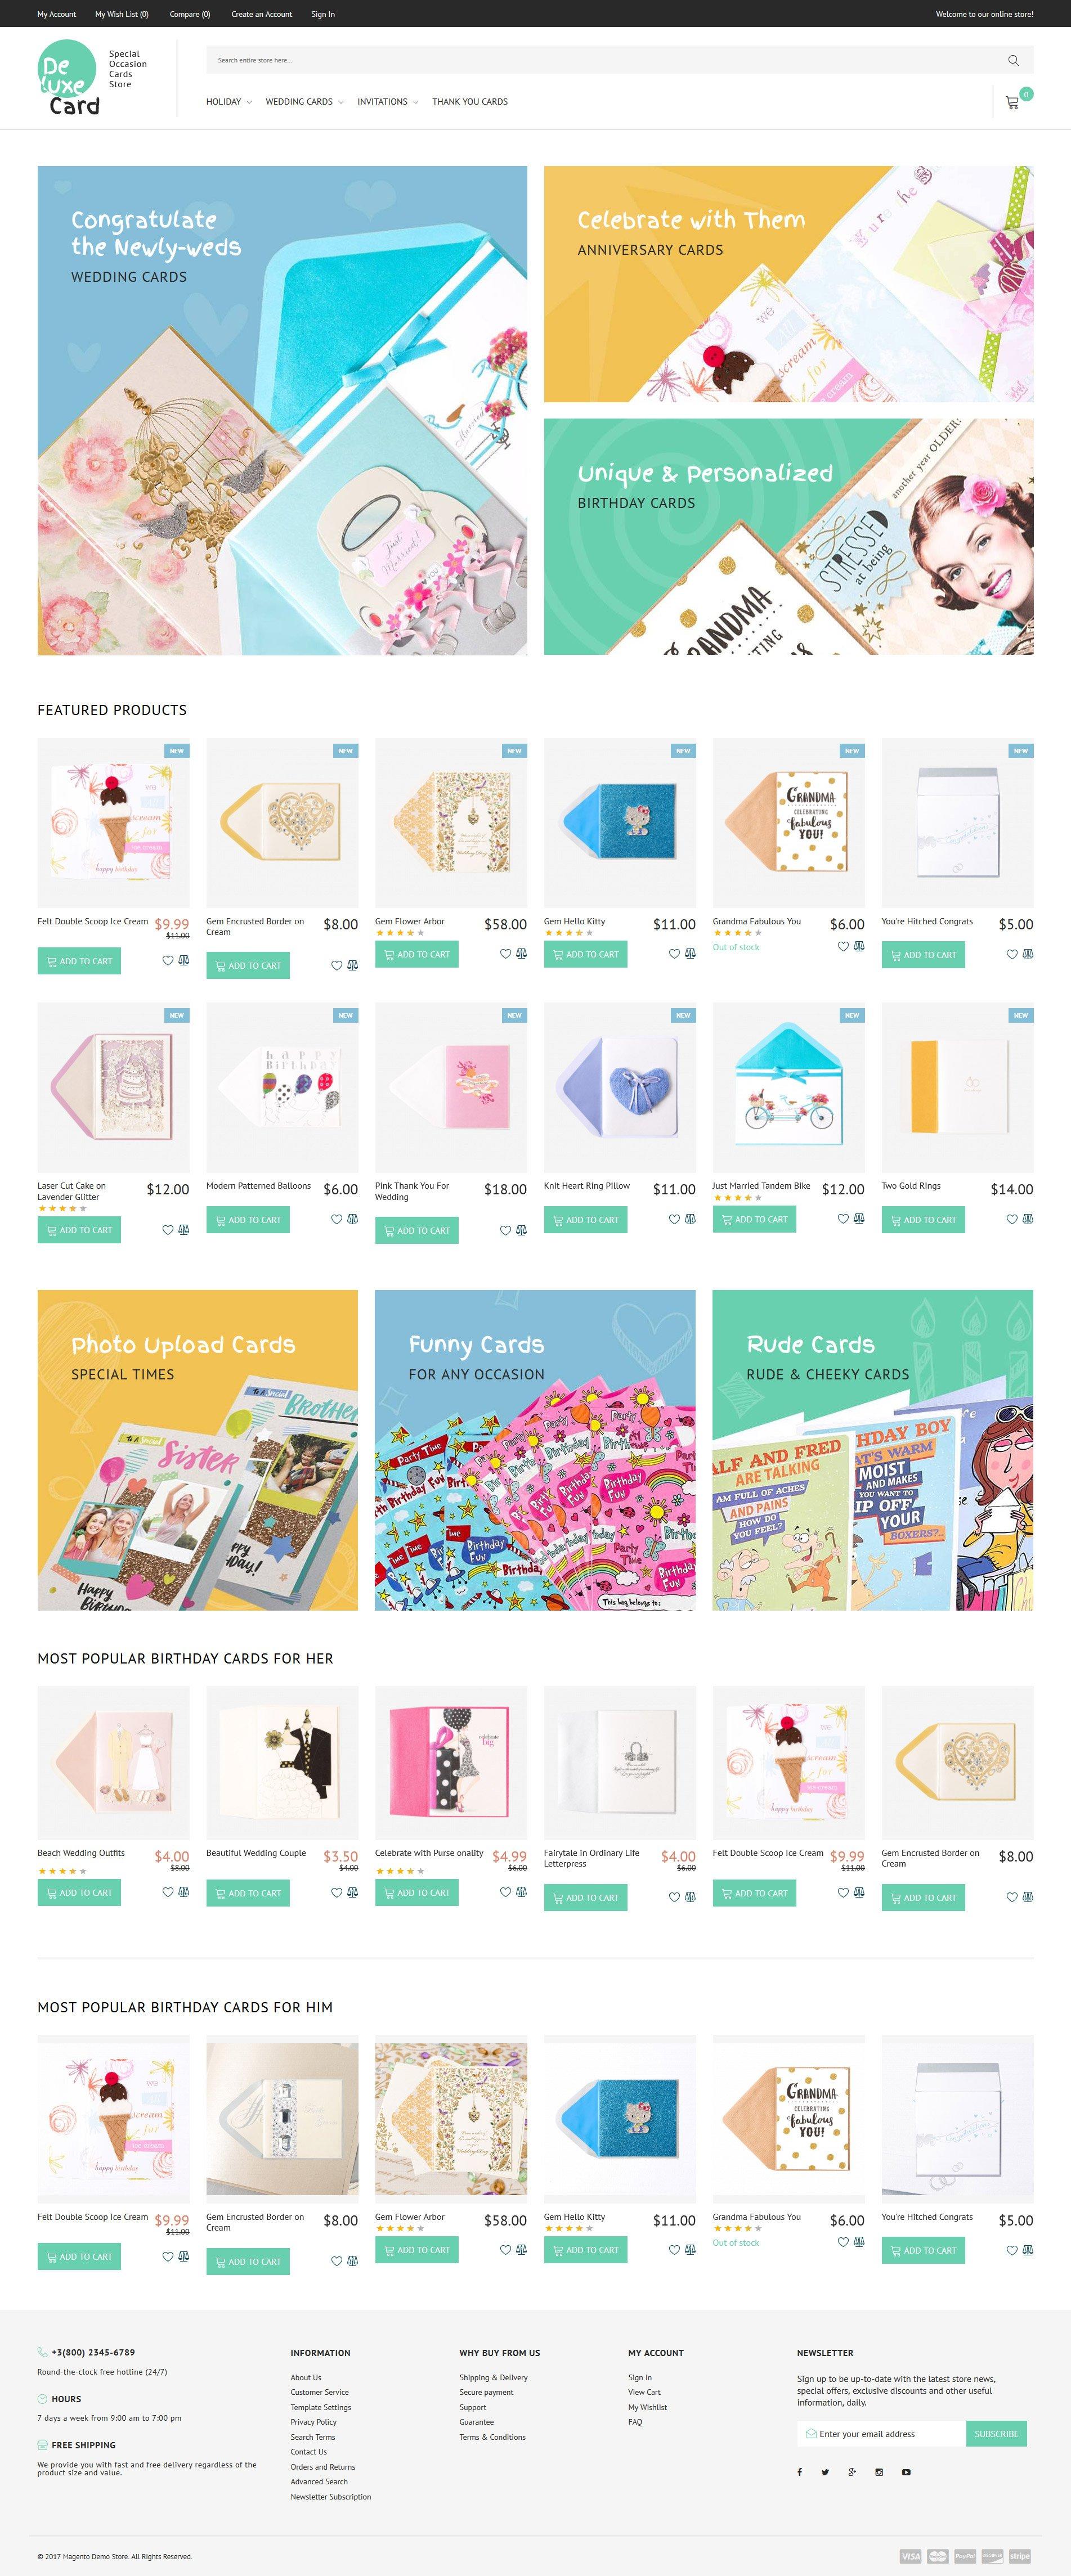 """Deluxe Card - Special Occasion Cards Store"" - адаптивний Magento шаблон №63846 - скріншот"